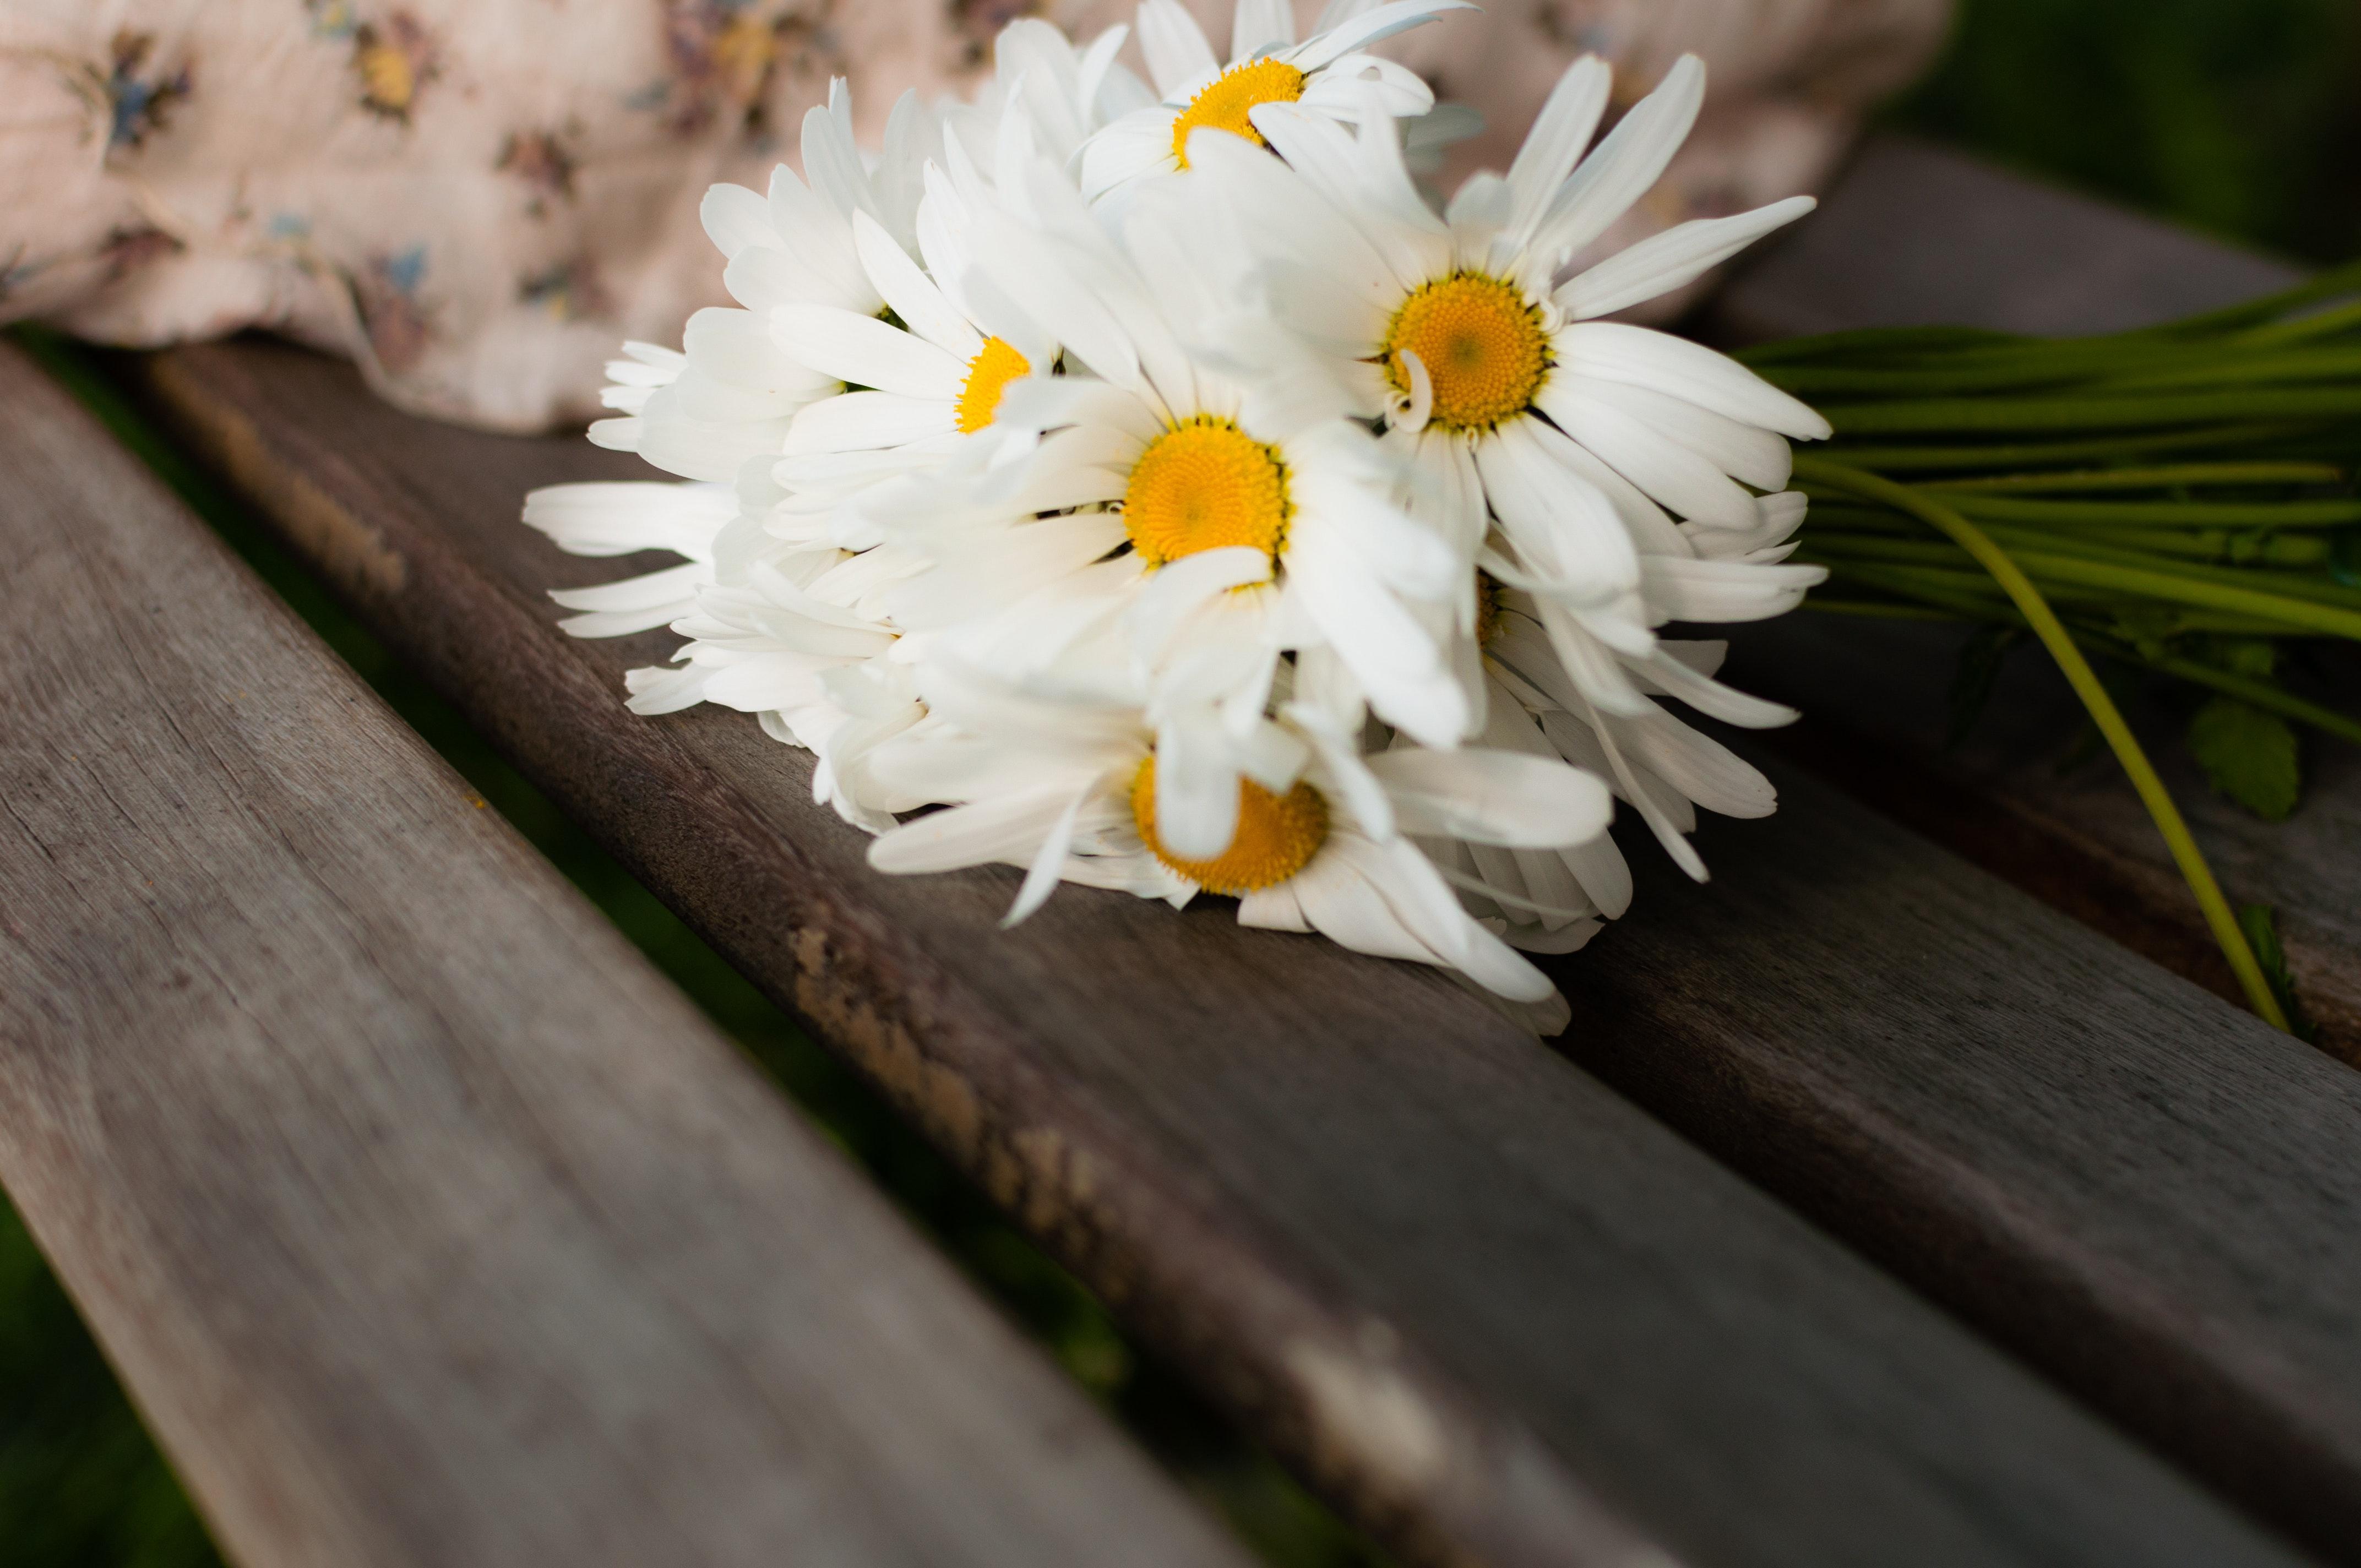 100 amazing daisy photos pexels free stock photos fetching more photos izmirmasajfo Image collections